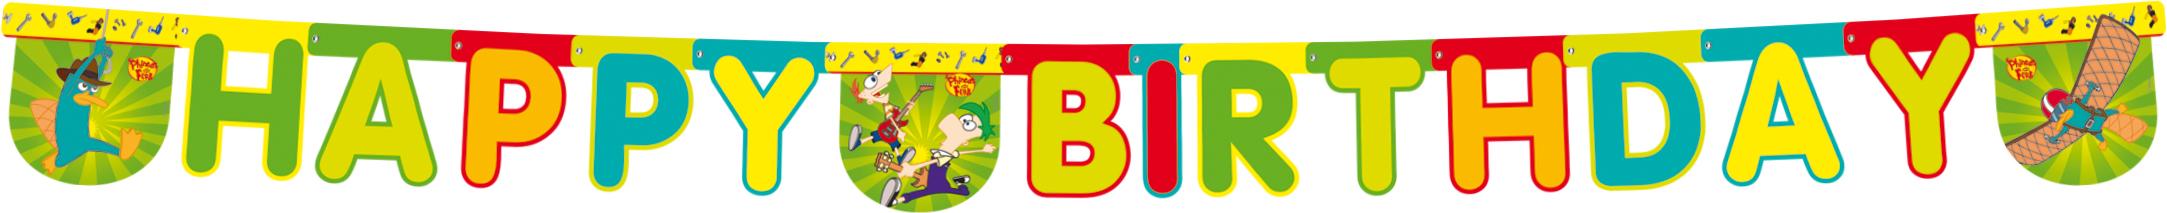 Poster Happy Birthday με κοπτικό Phineas & Ferb